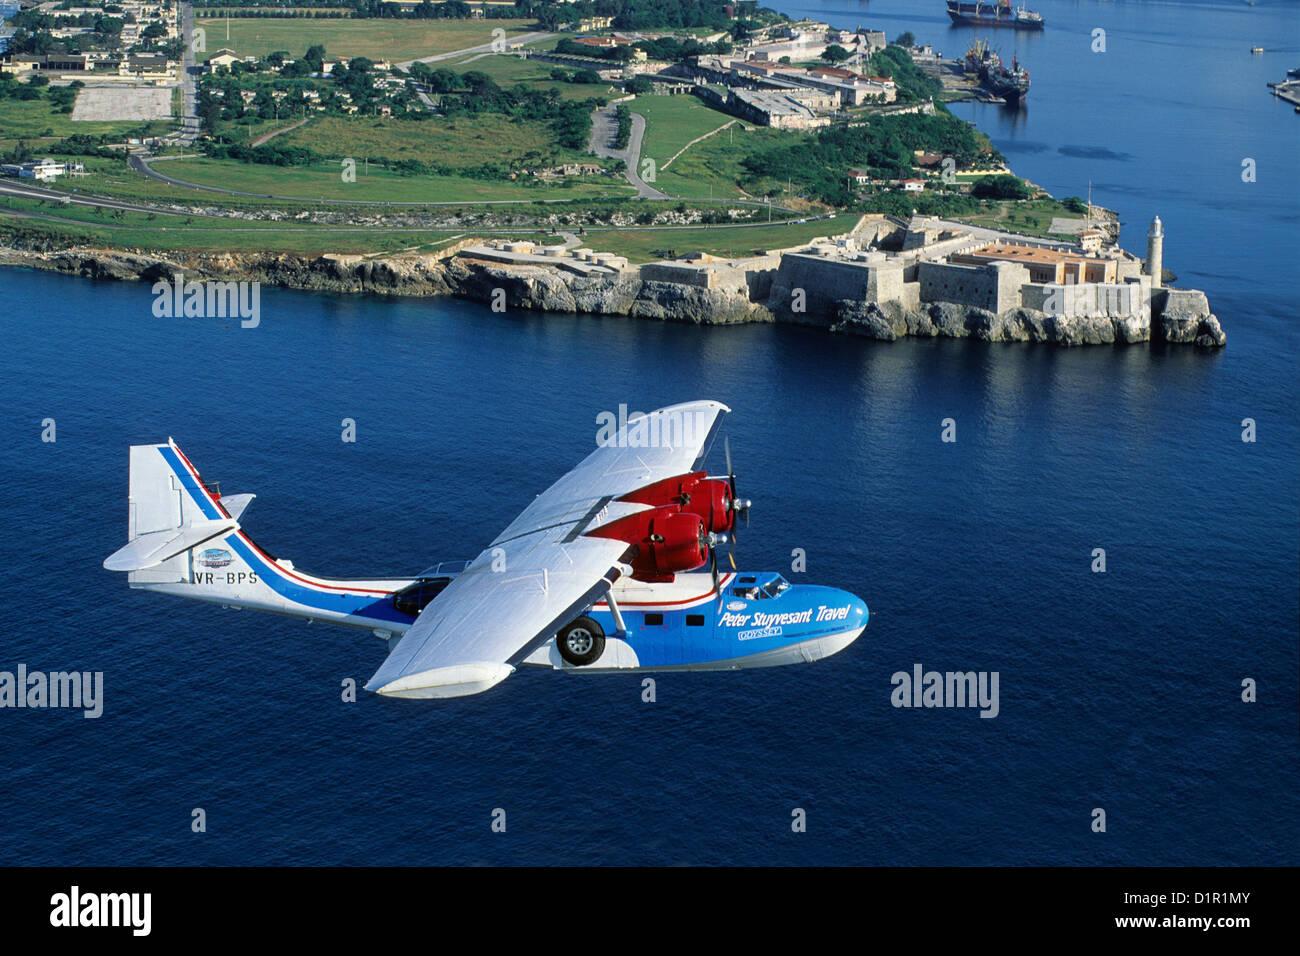 Cuba, Havana, fort, Catalina PBY-5A hydroplane. - Stock Image